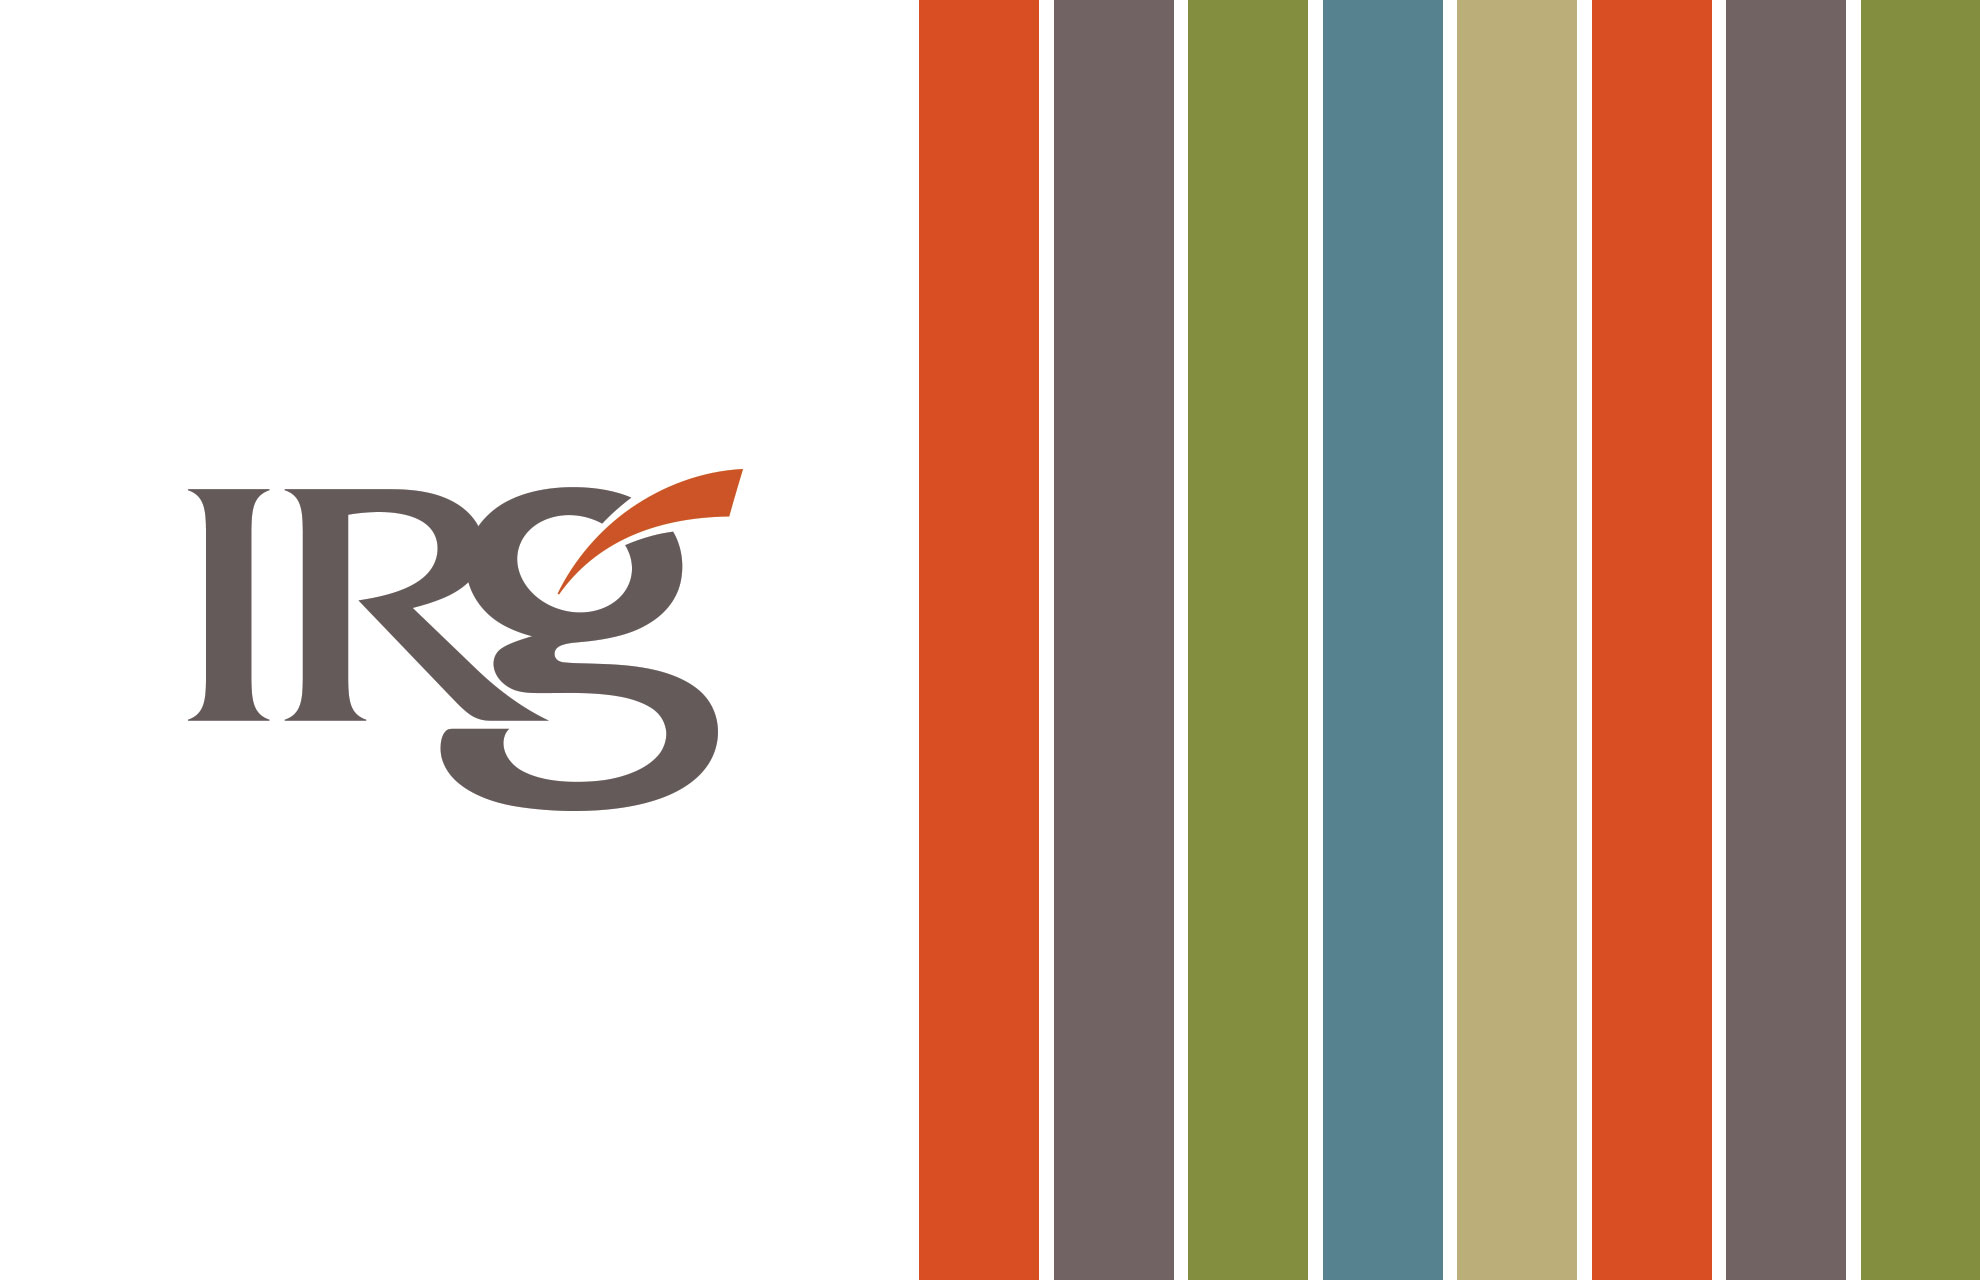 IRG Identity Programme